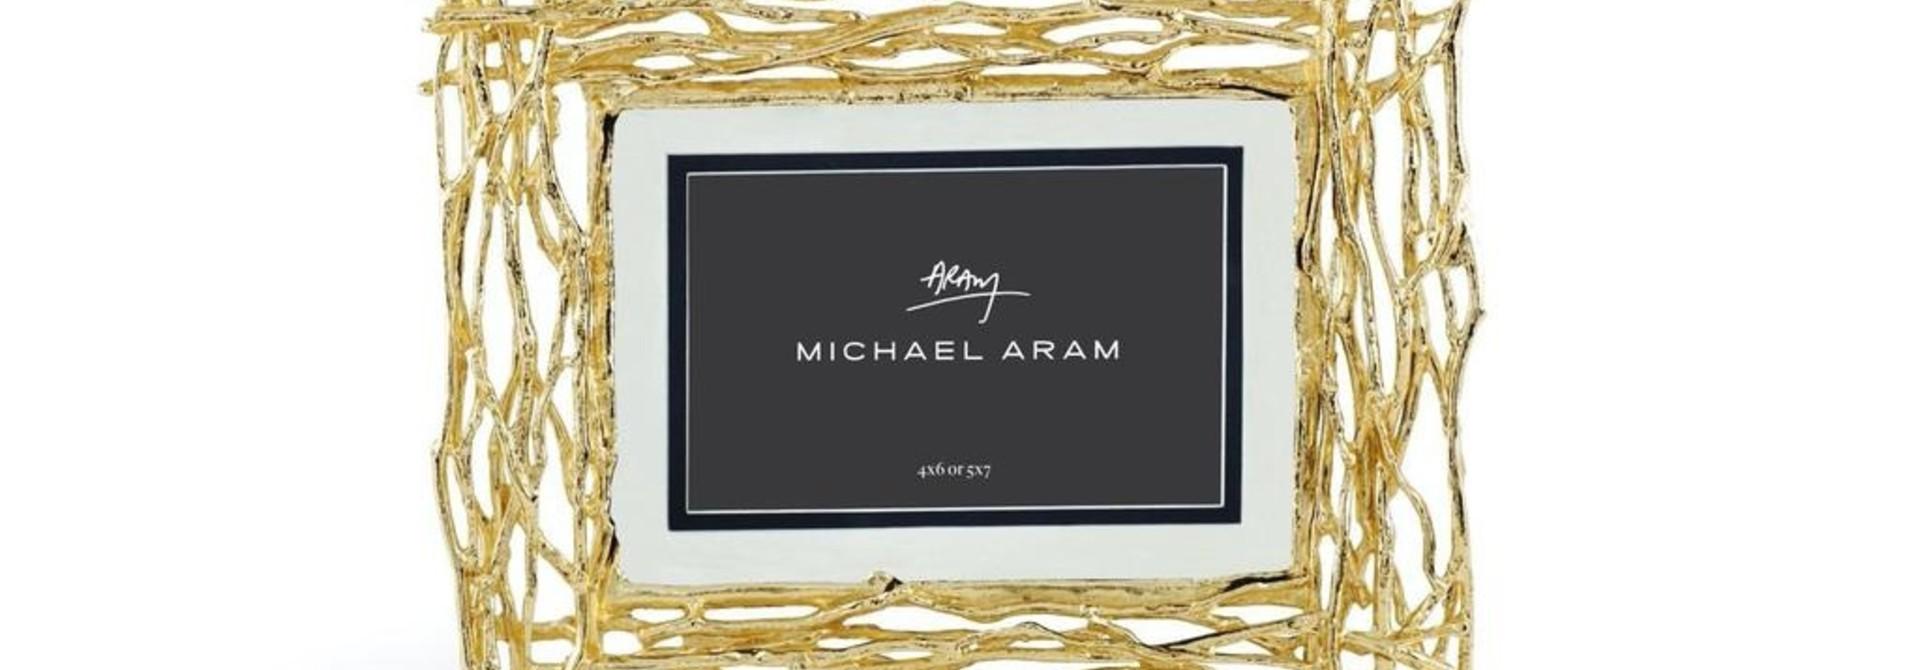 MICHAEL ARAM - Photo Frame Twig 26x21cm